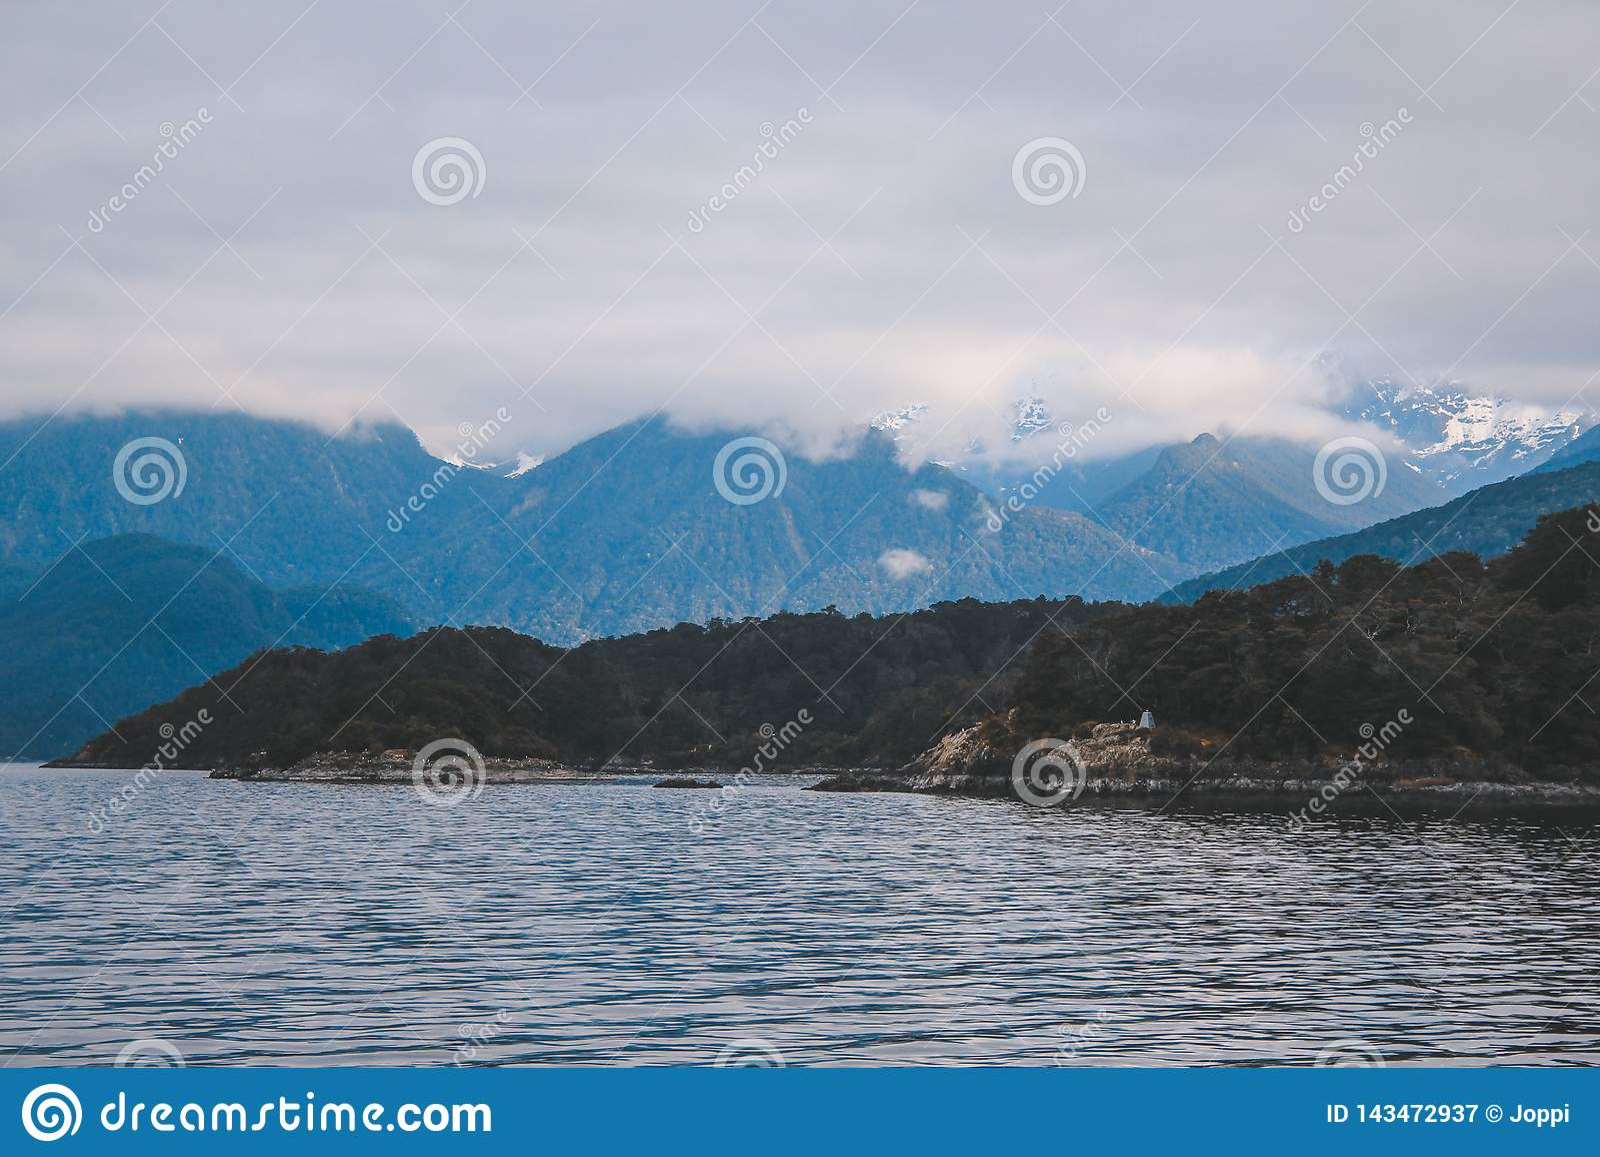 Cruzeiro sadio duvidoso - lago de cruzamento Manapouri antes de ir aos sons reais, parque nacional de Fiordland, ilha sul, Nova Z